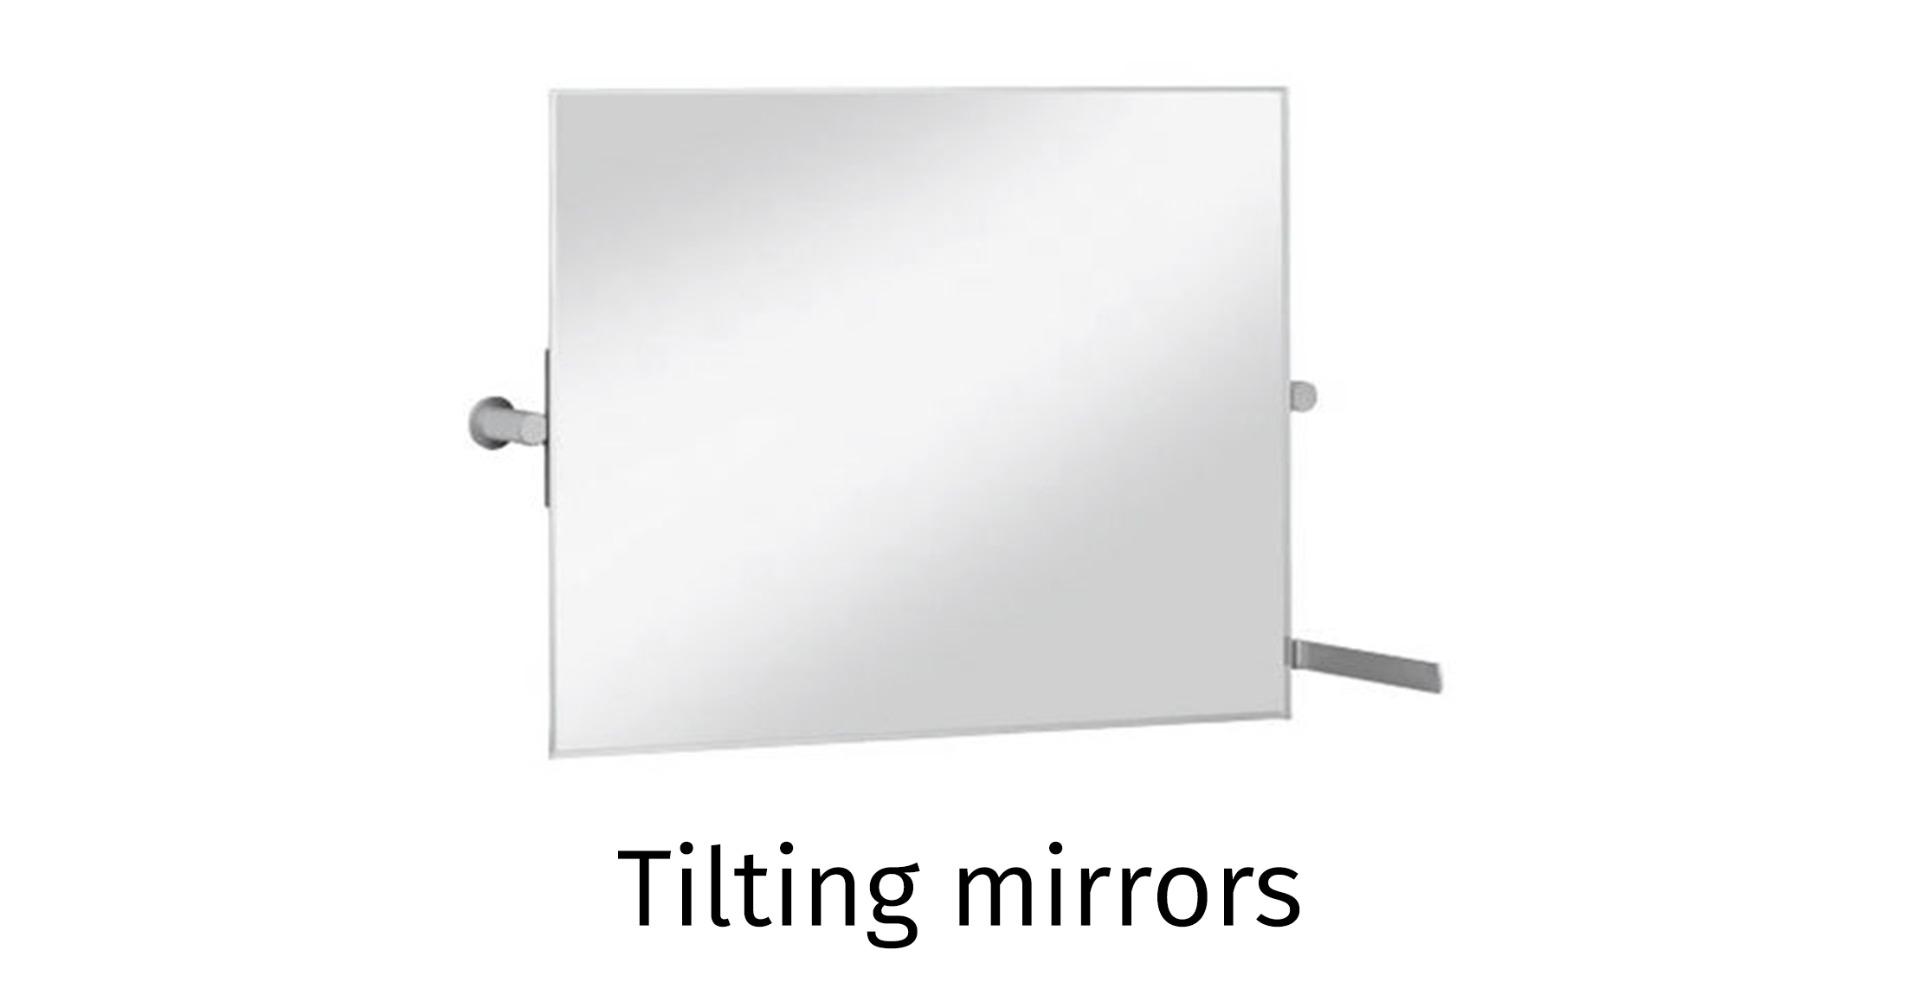 Tilting mirrors